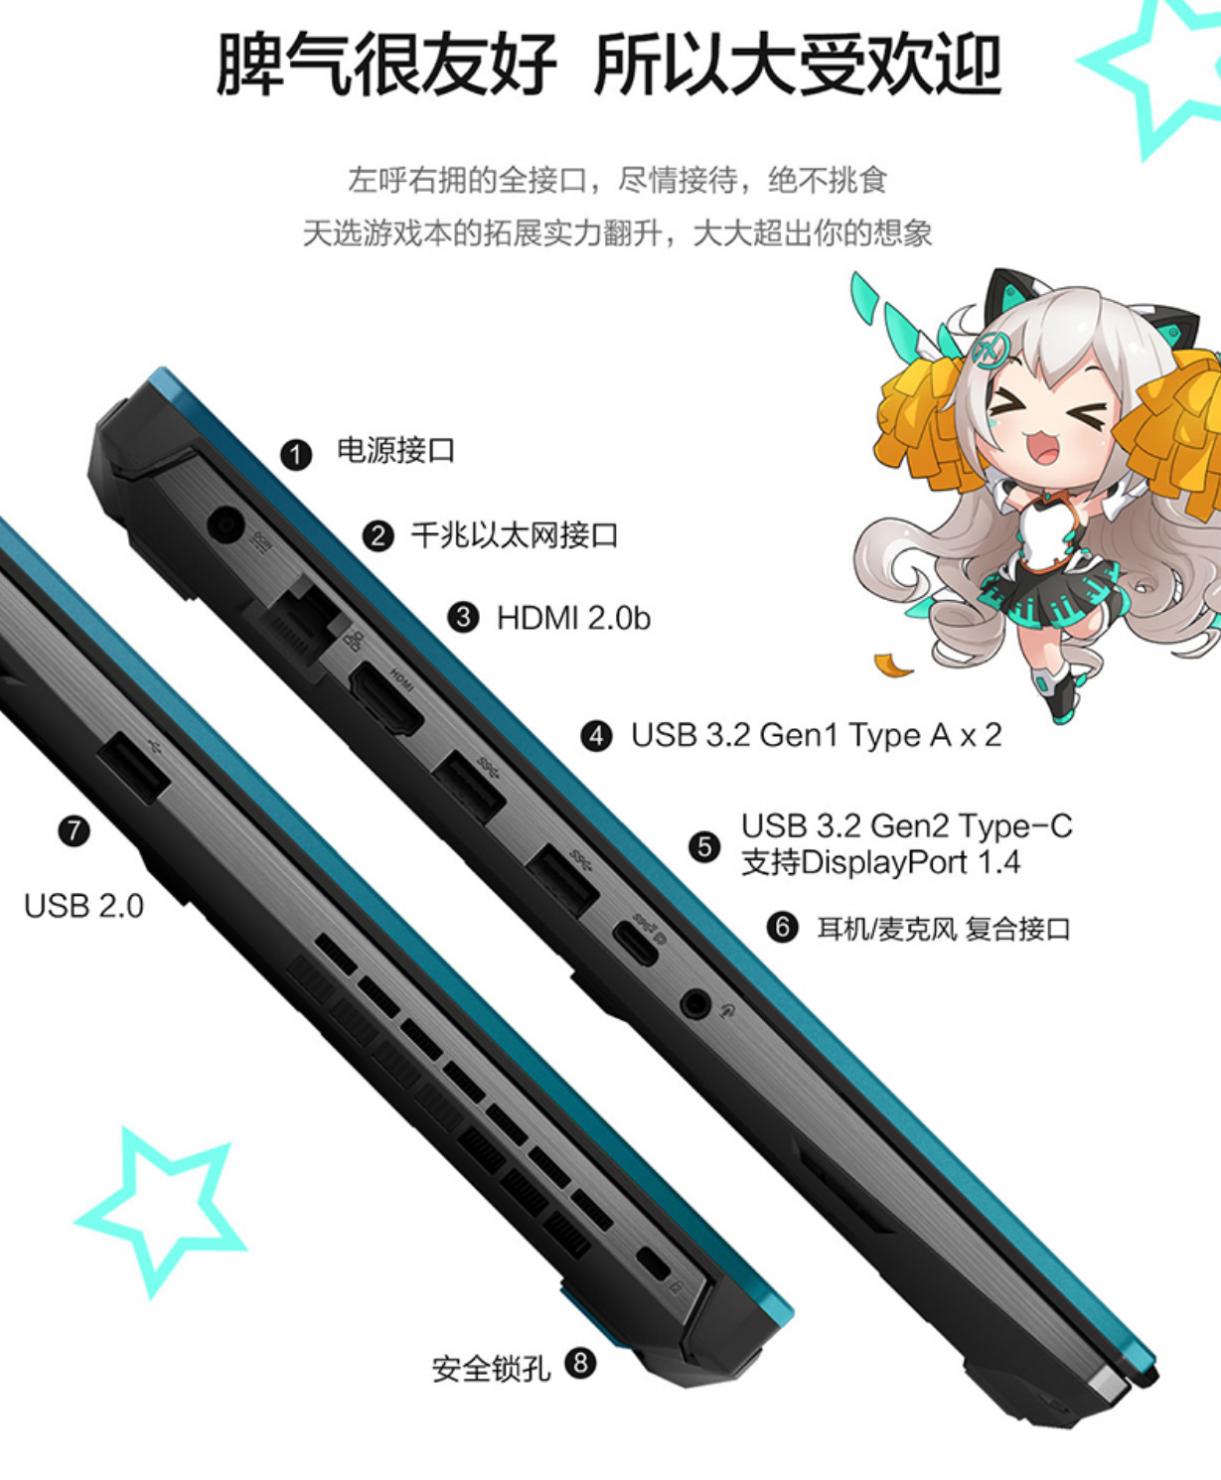 amd-ryzen-7-4800h-8-core-cpu-nvidia-geforce-rtx-2060-gaming-notebook_asus-tuf-gaming-a15_4